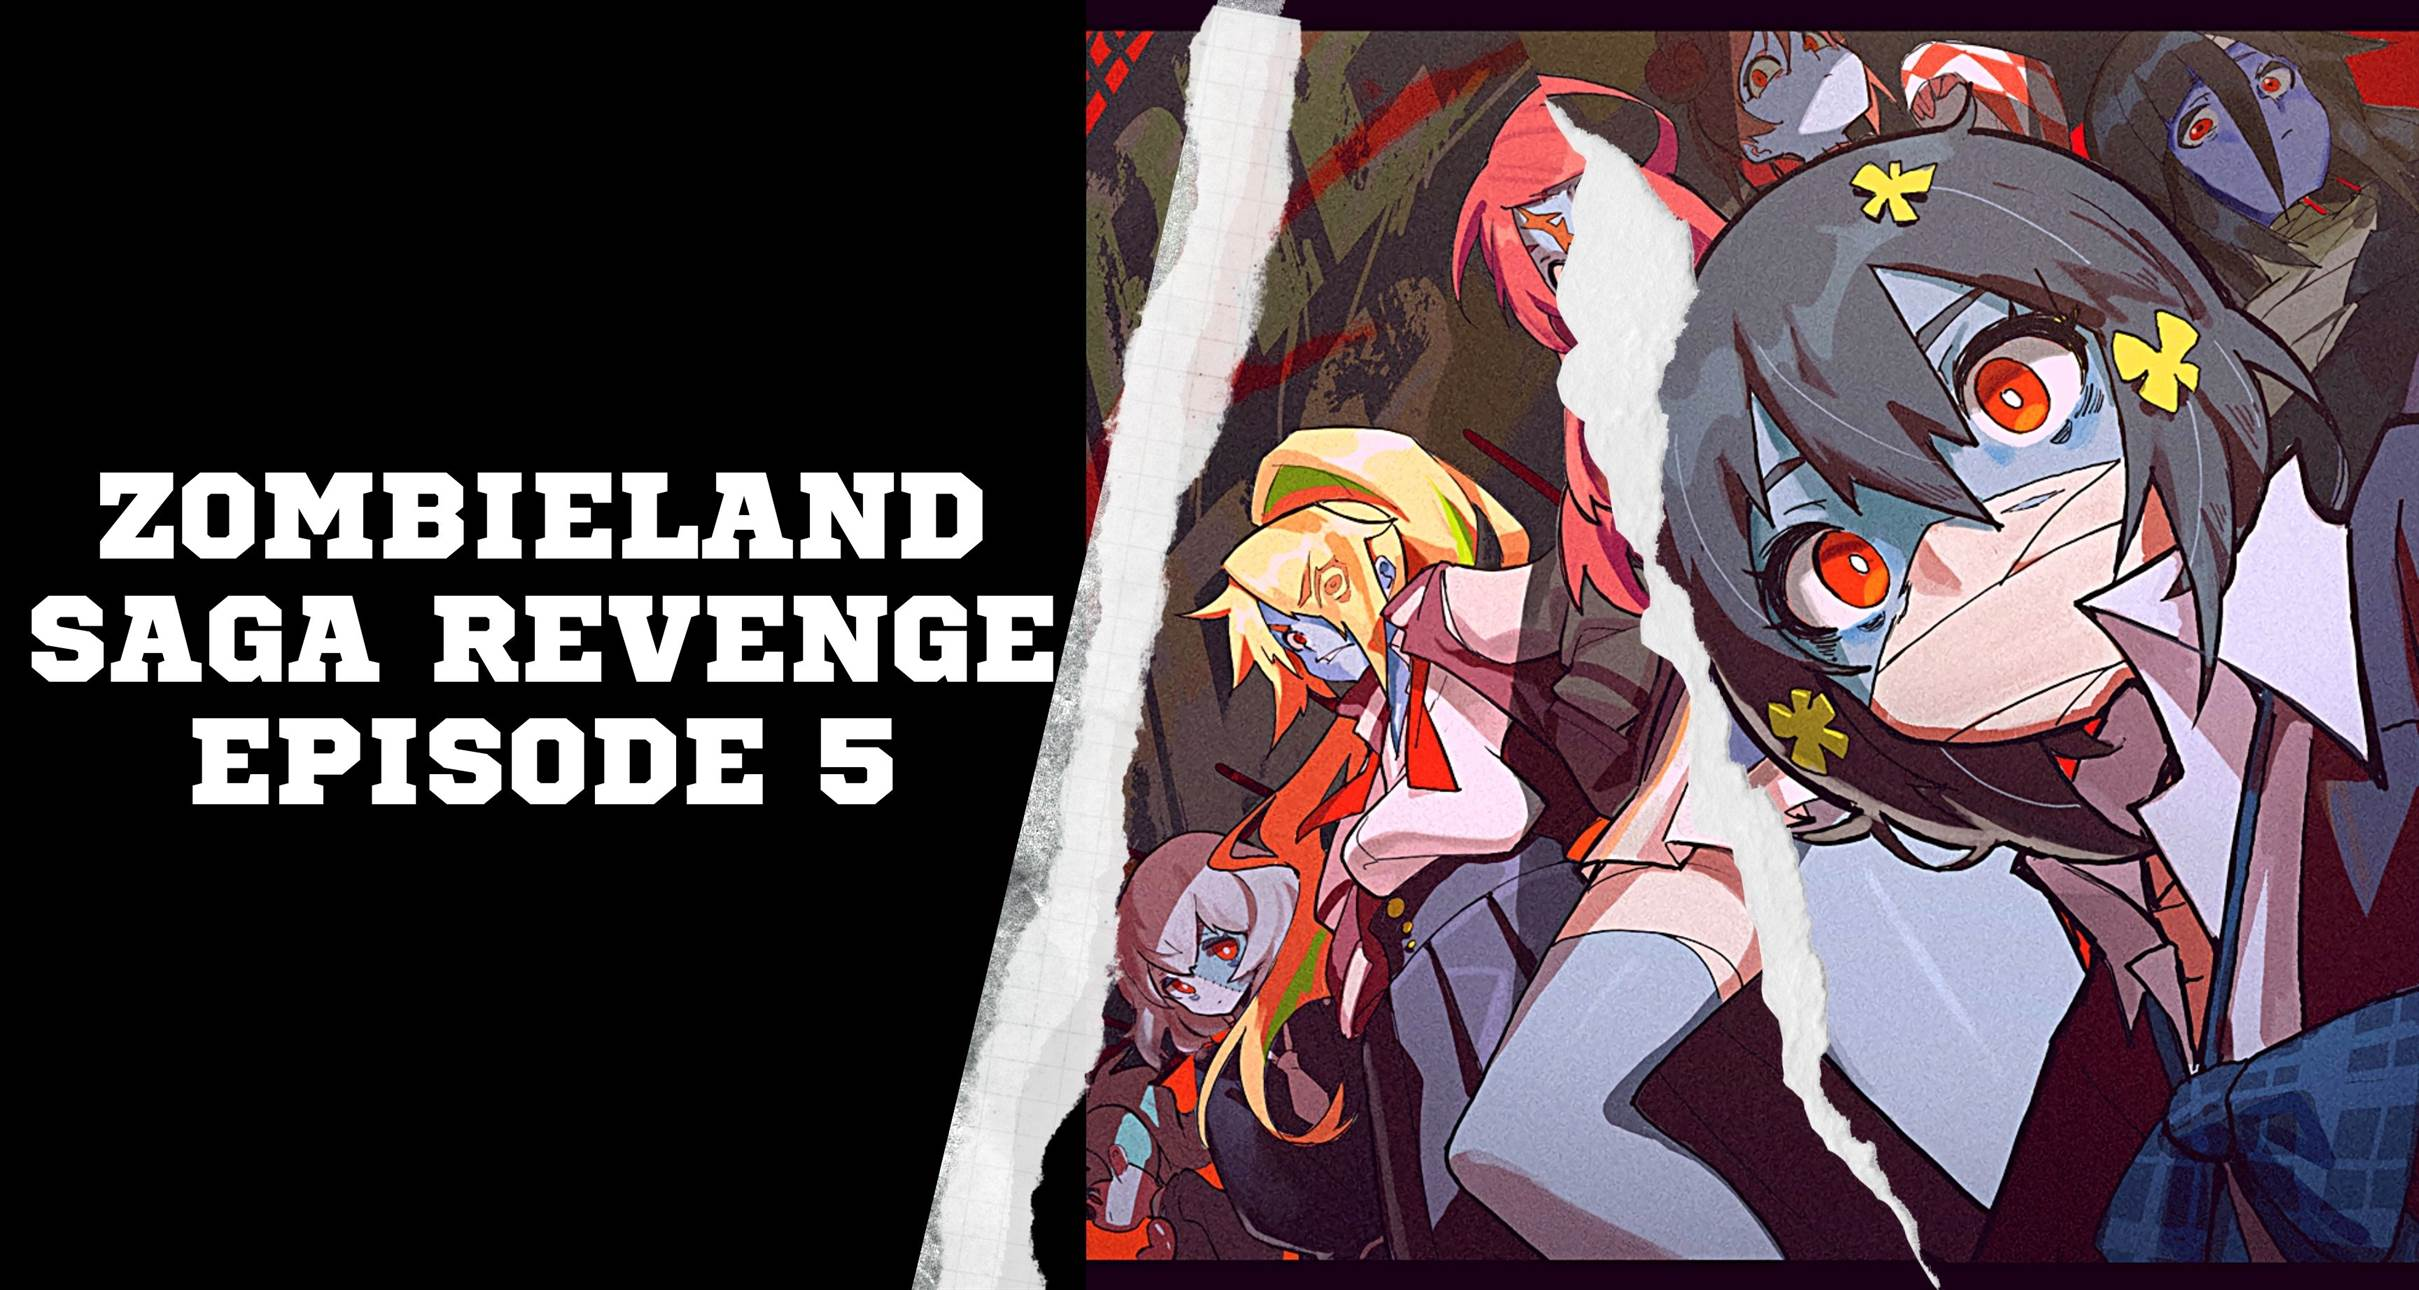 Zombieland Saga Revenge Episode 5